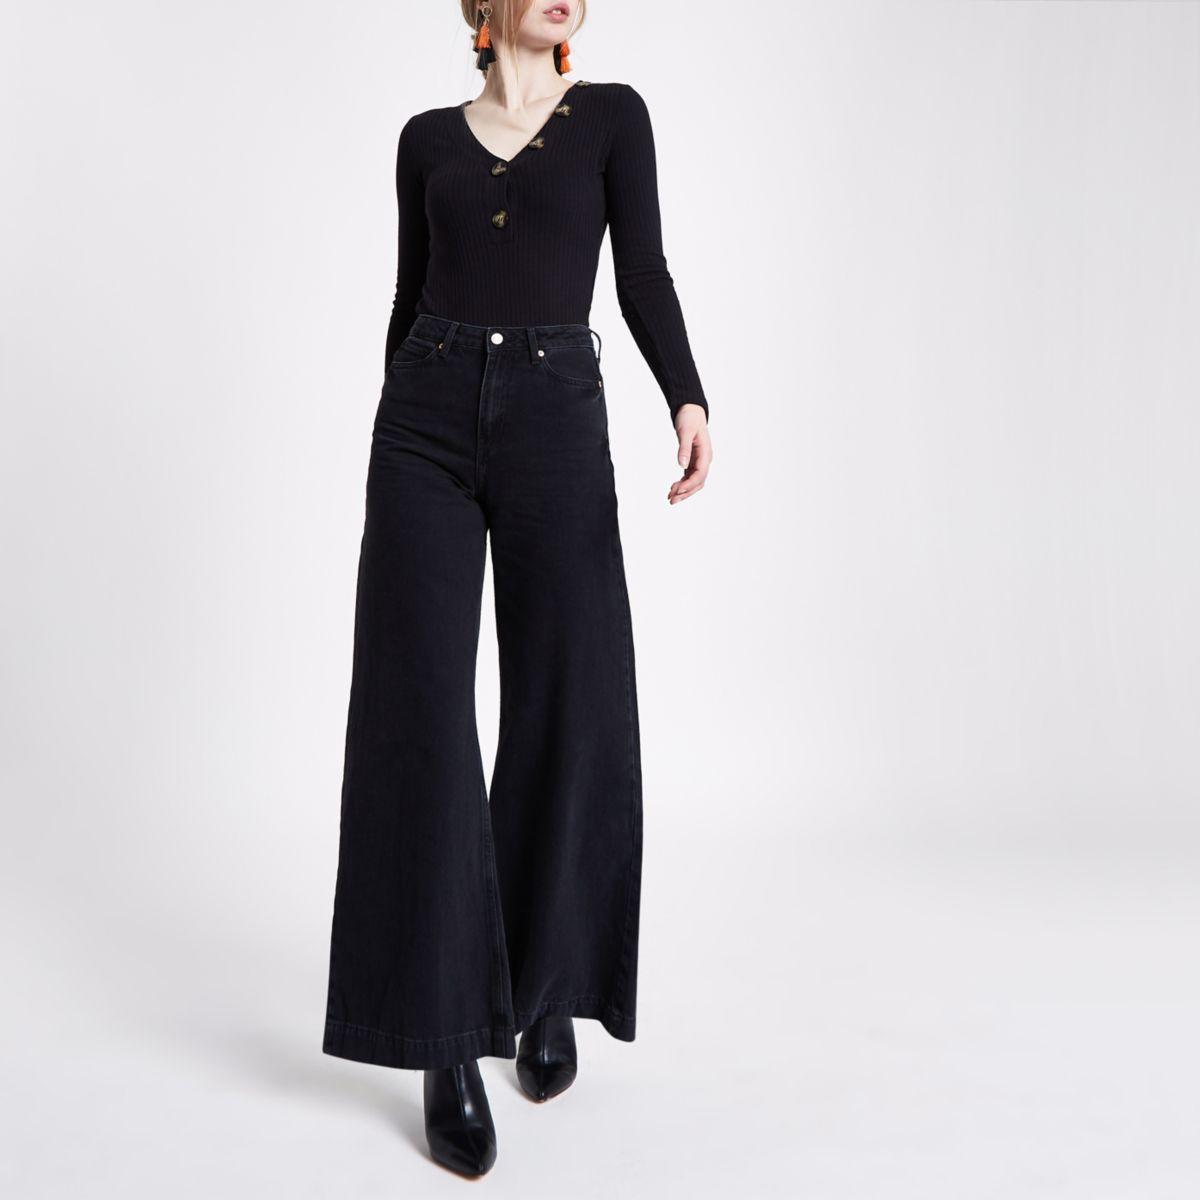 Black rib V neck button long sleeve bodysuit